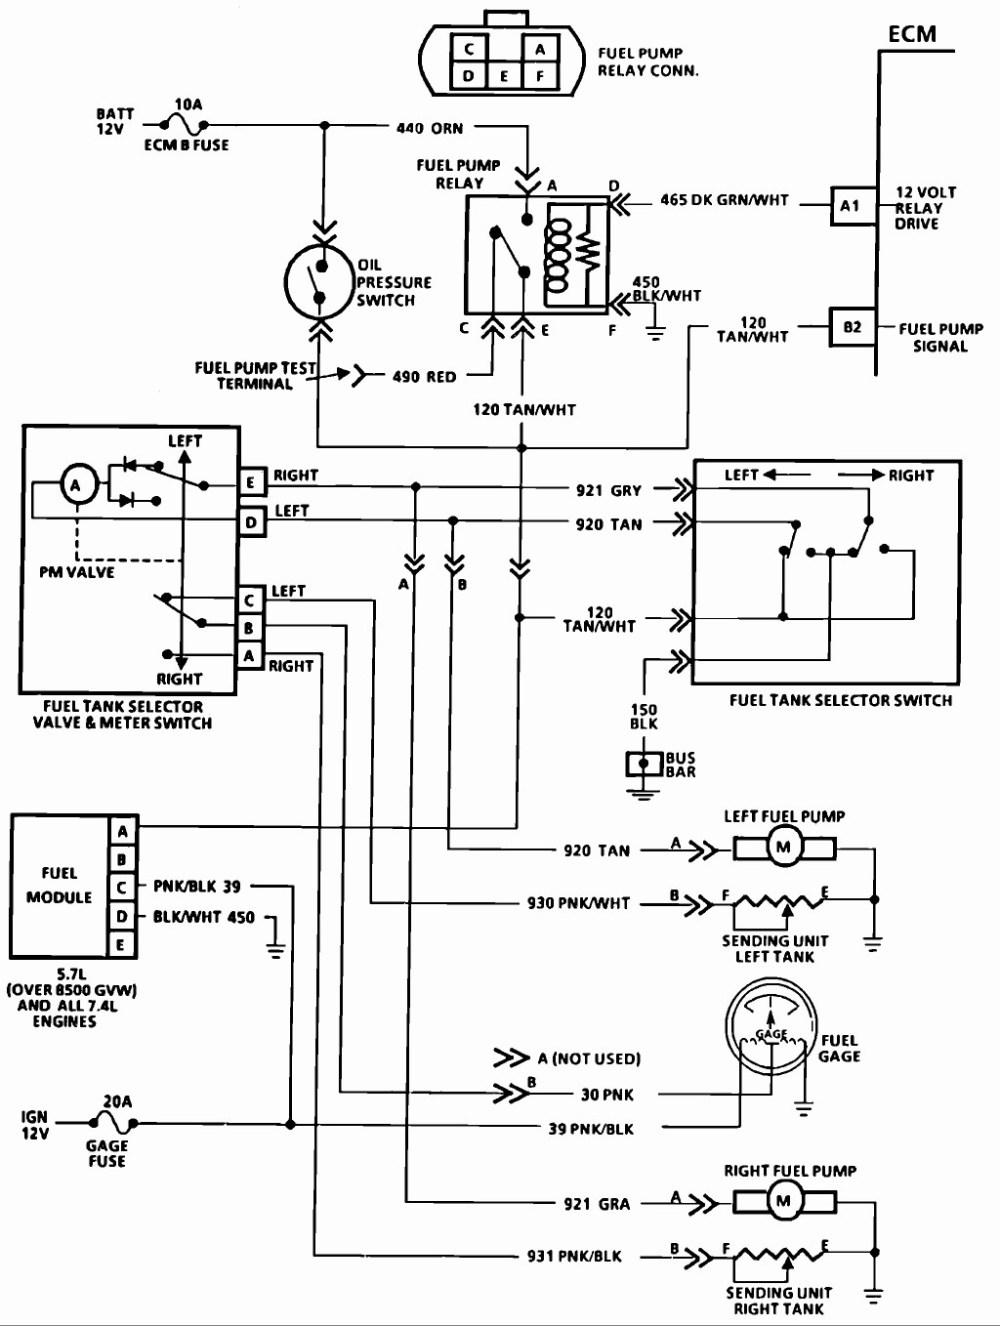 medium resolution of 1998 chevy fuel pump wiring wiring diagram forward 2004 gmc sierra fuel pump wiring diagram 1998